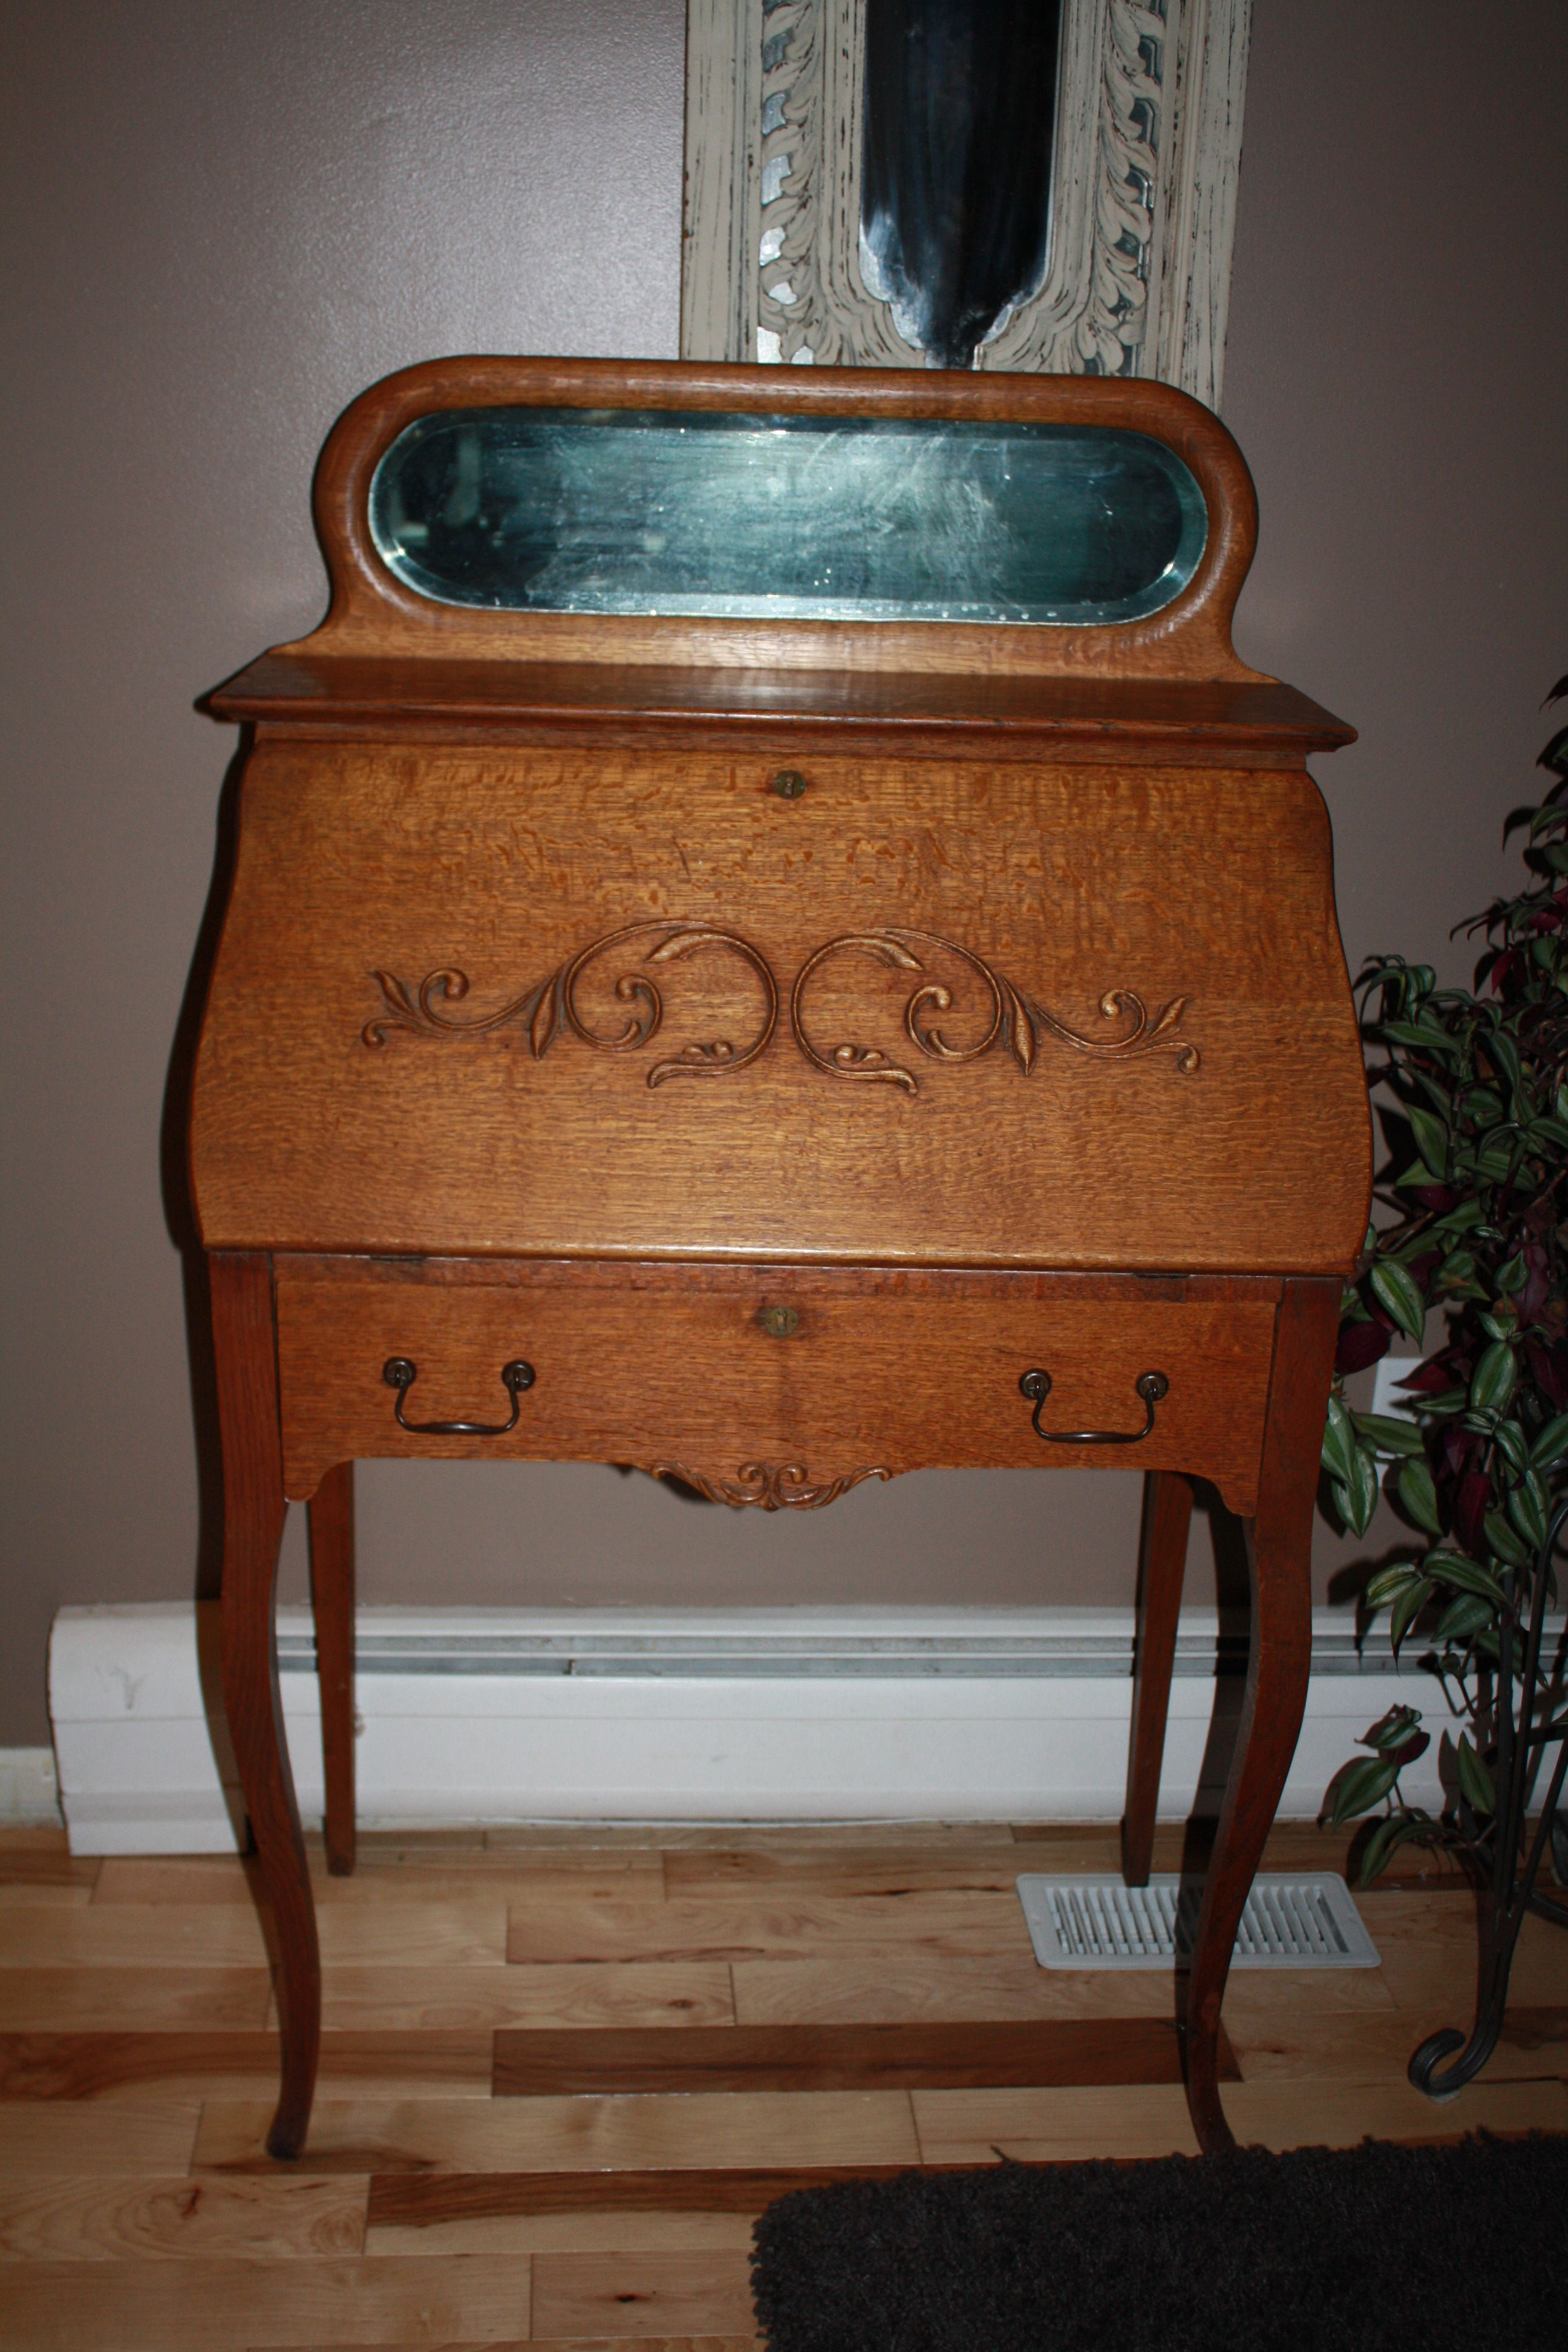 Ornate Secretary Desk Antique For Sale By Redeemed Furnishings